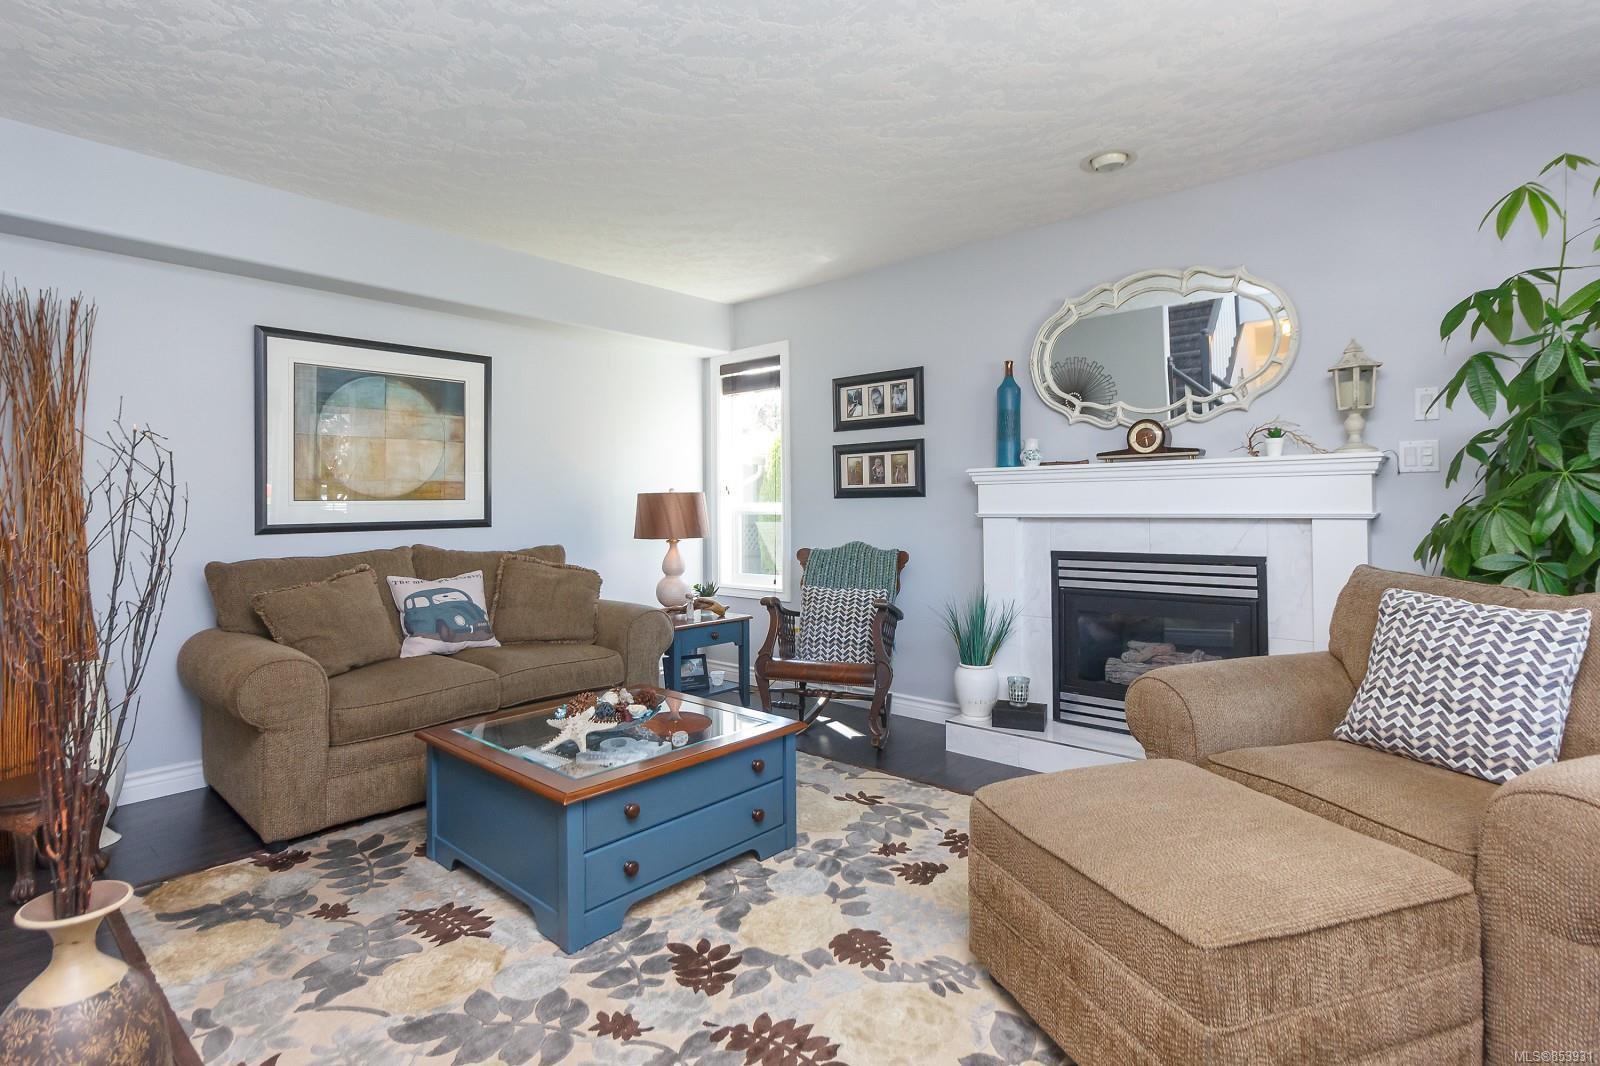 Photo 19: Photos: 2456 Timbercrest Dr in : Du East Duncan House for sale (Duncan)  : MLS®# 853931